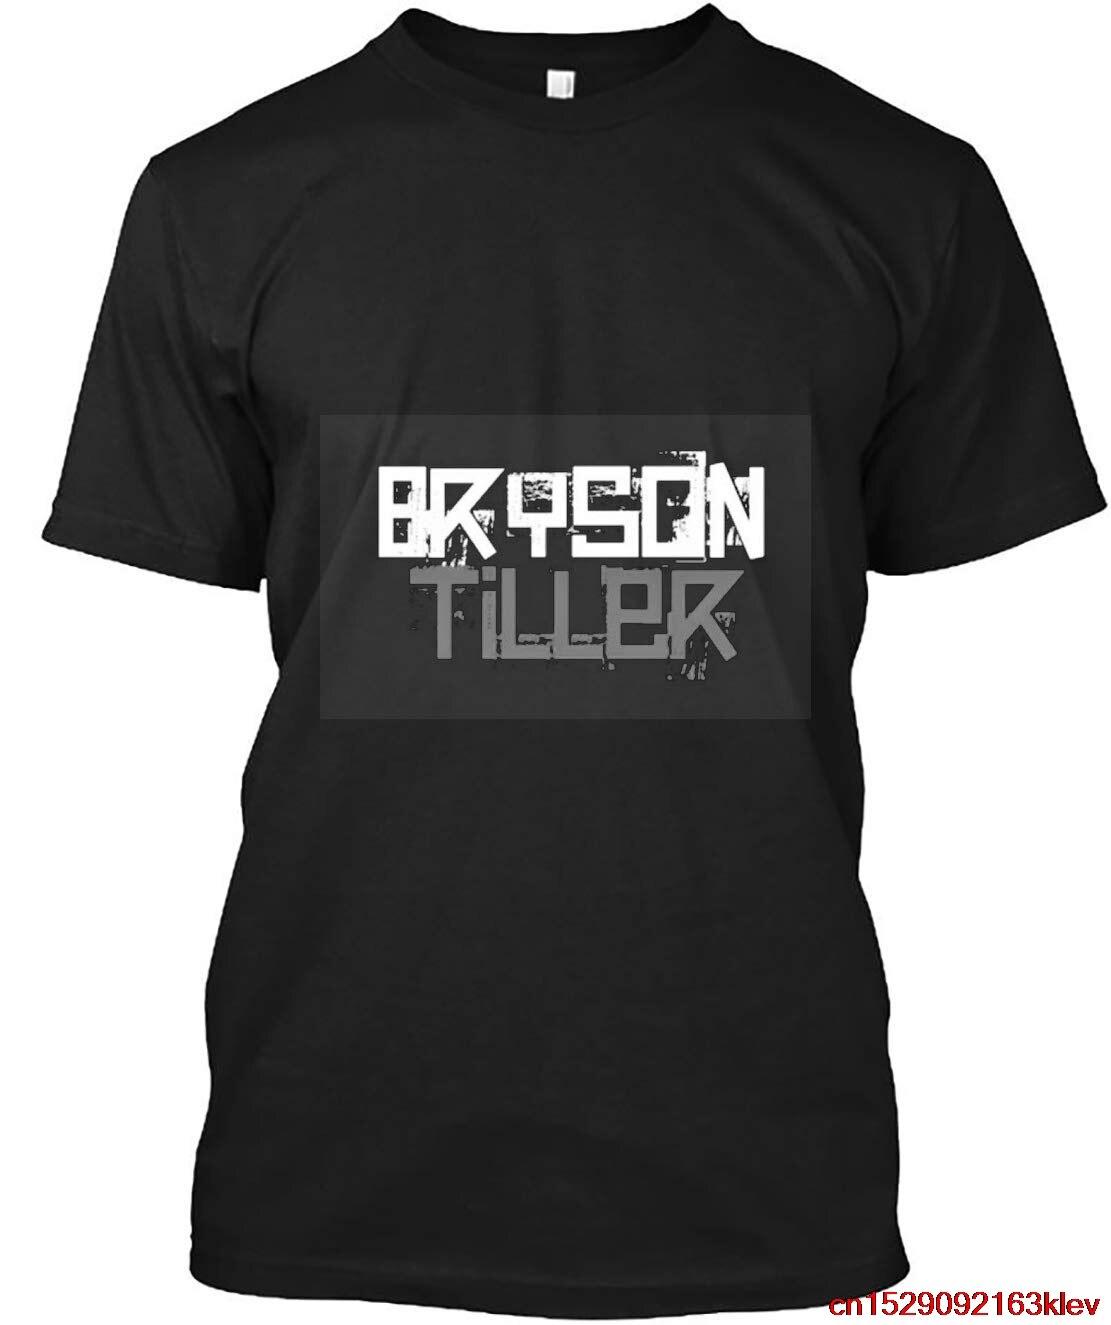 Bryson Tiller concert 2017 18 футболка для мужчин женщин мужчин 1 Мужская Женская Мужская футболка